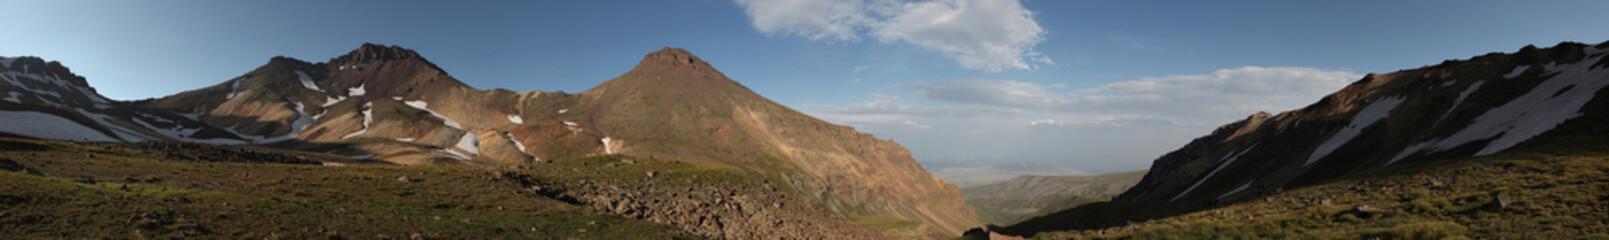 Mount Aragats, Armenia.